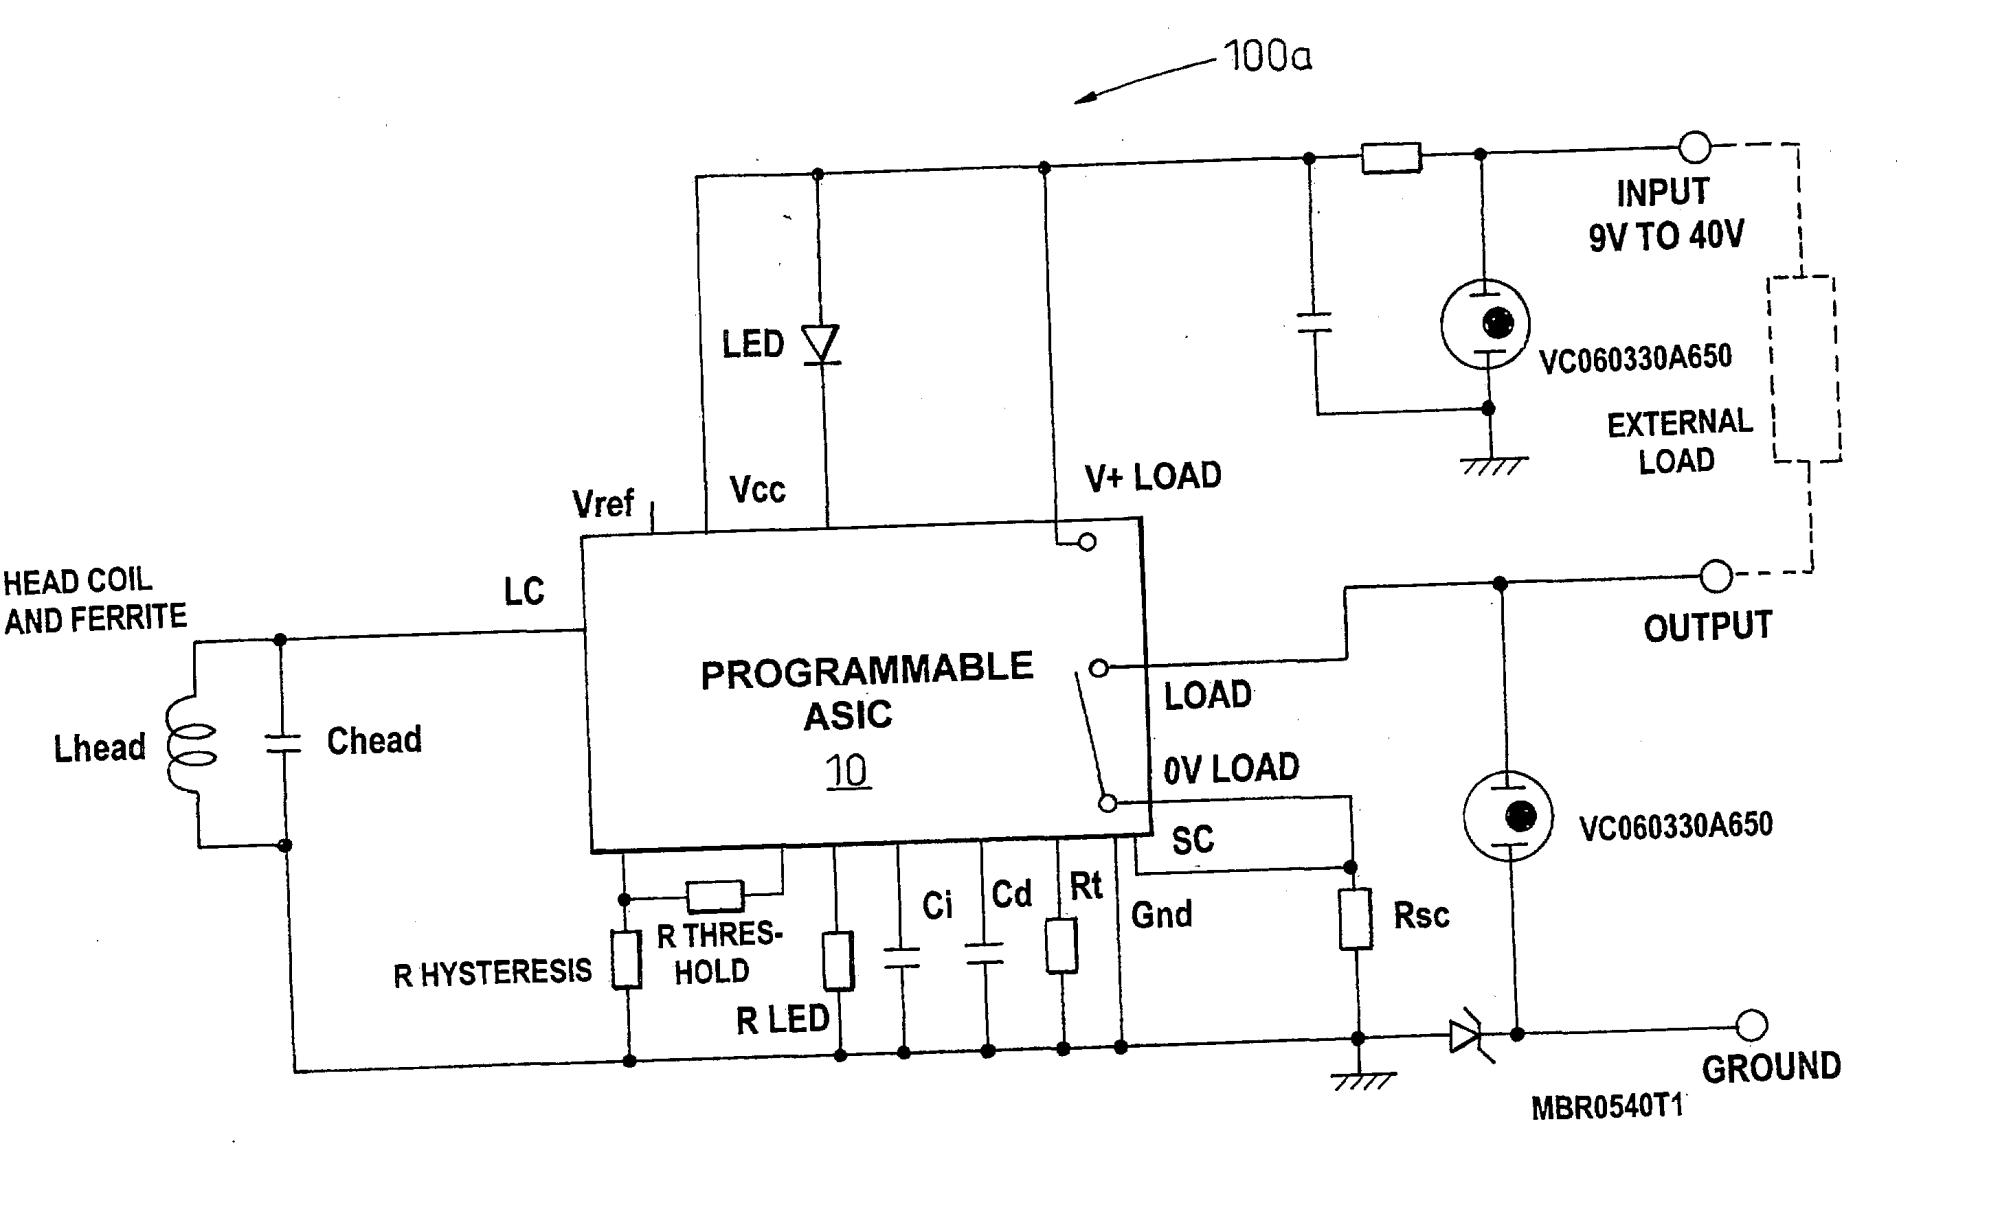 hight resolution of 3 wire proximity switch diagram wiring library rh 78 skriptoase de allen bradley proximity sensor tester prox tester